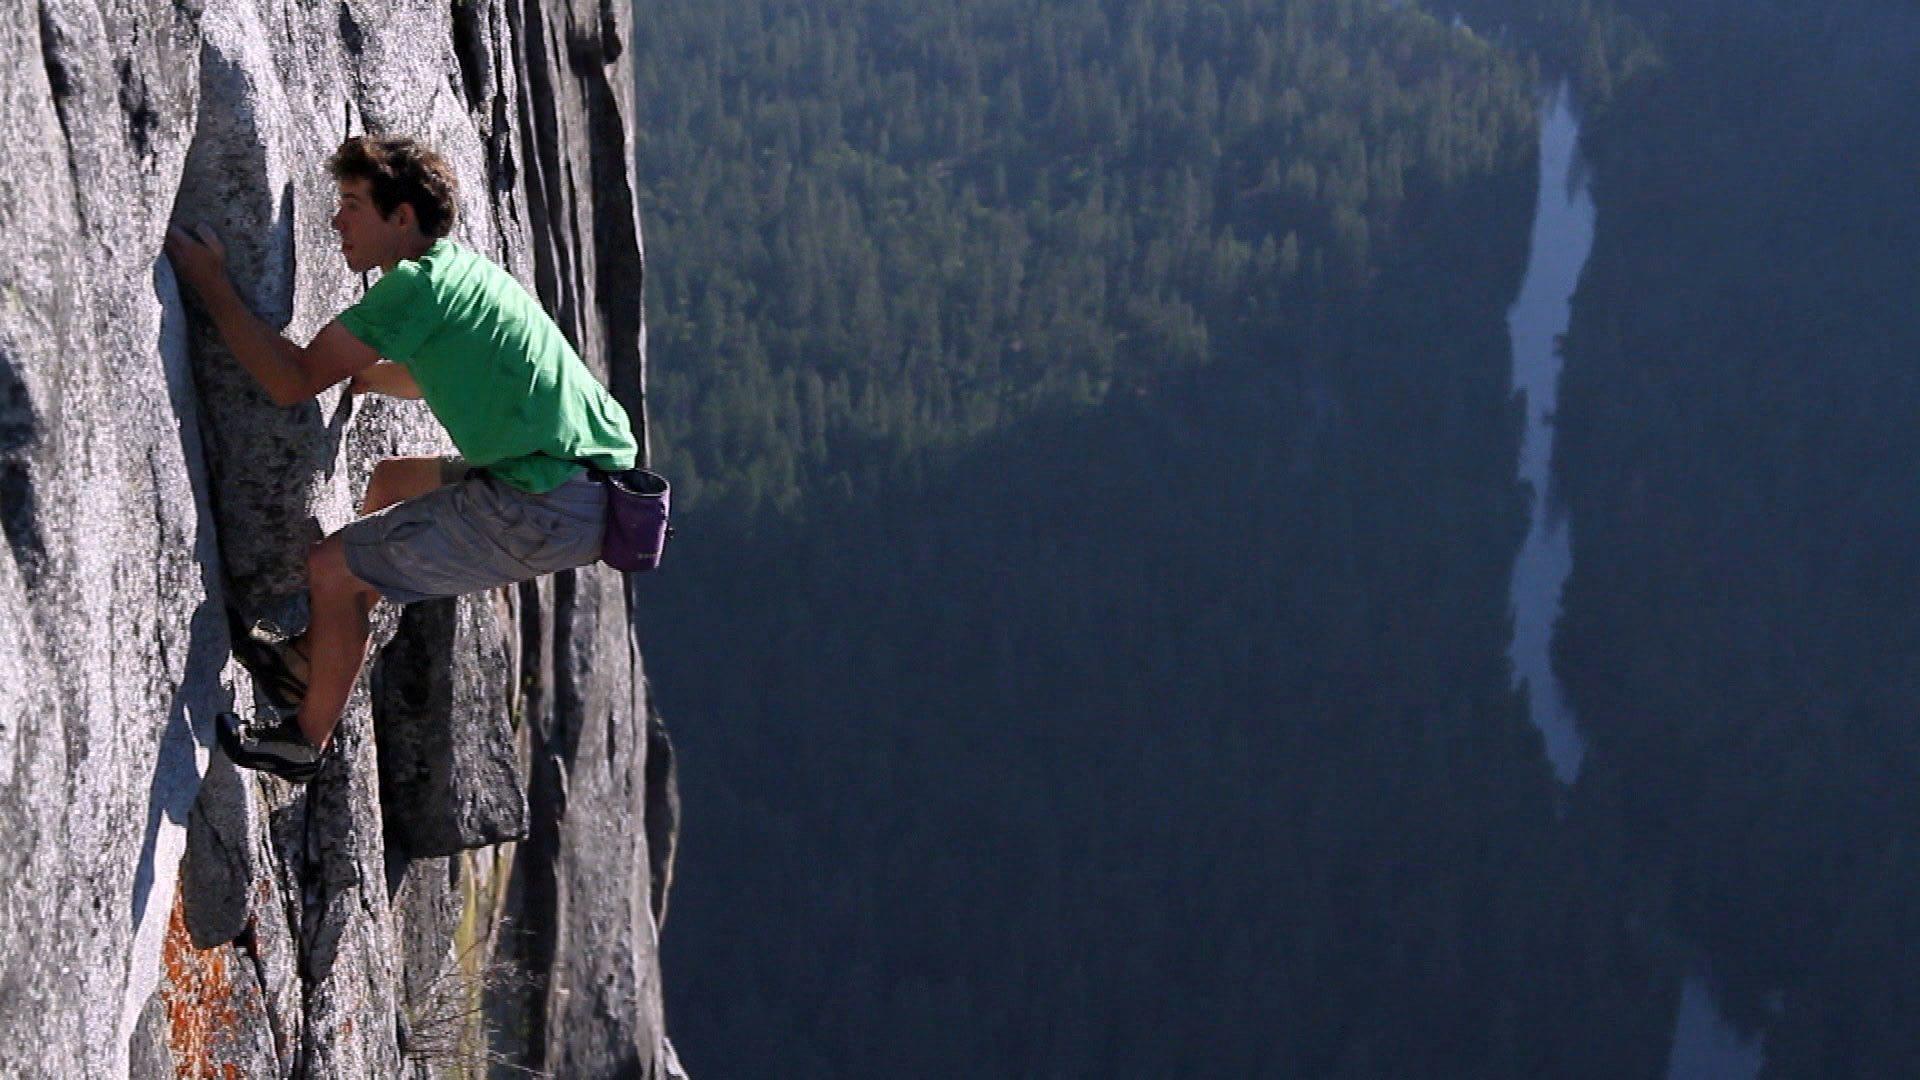 Image: Alex Honnold climbing